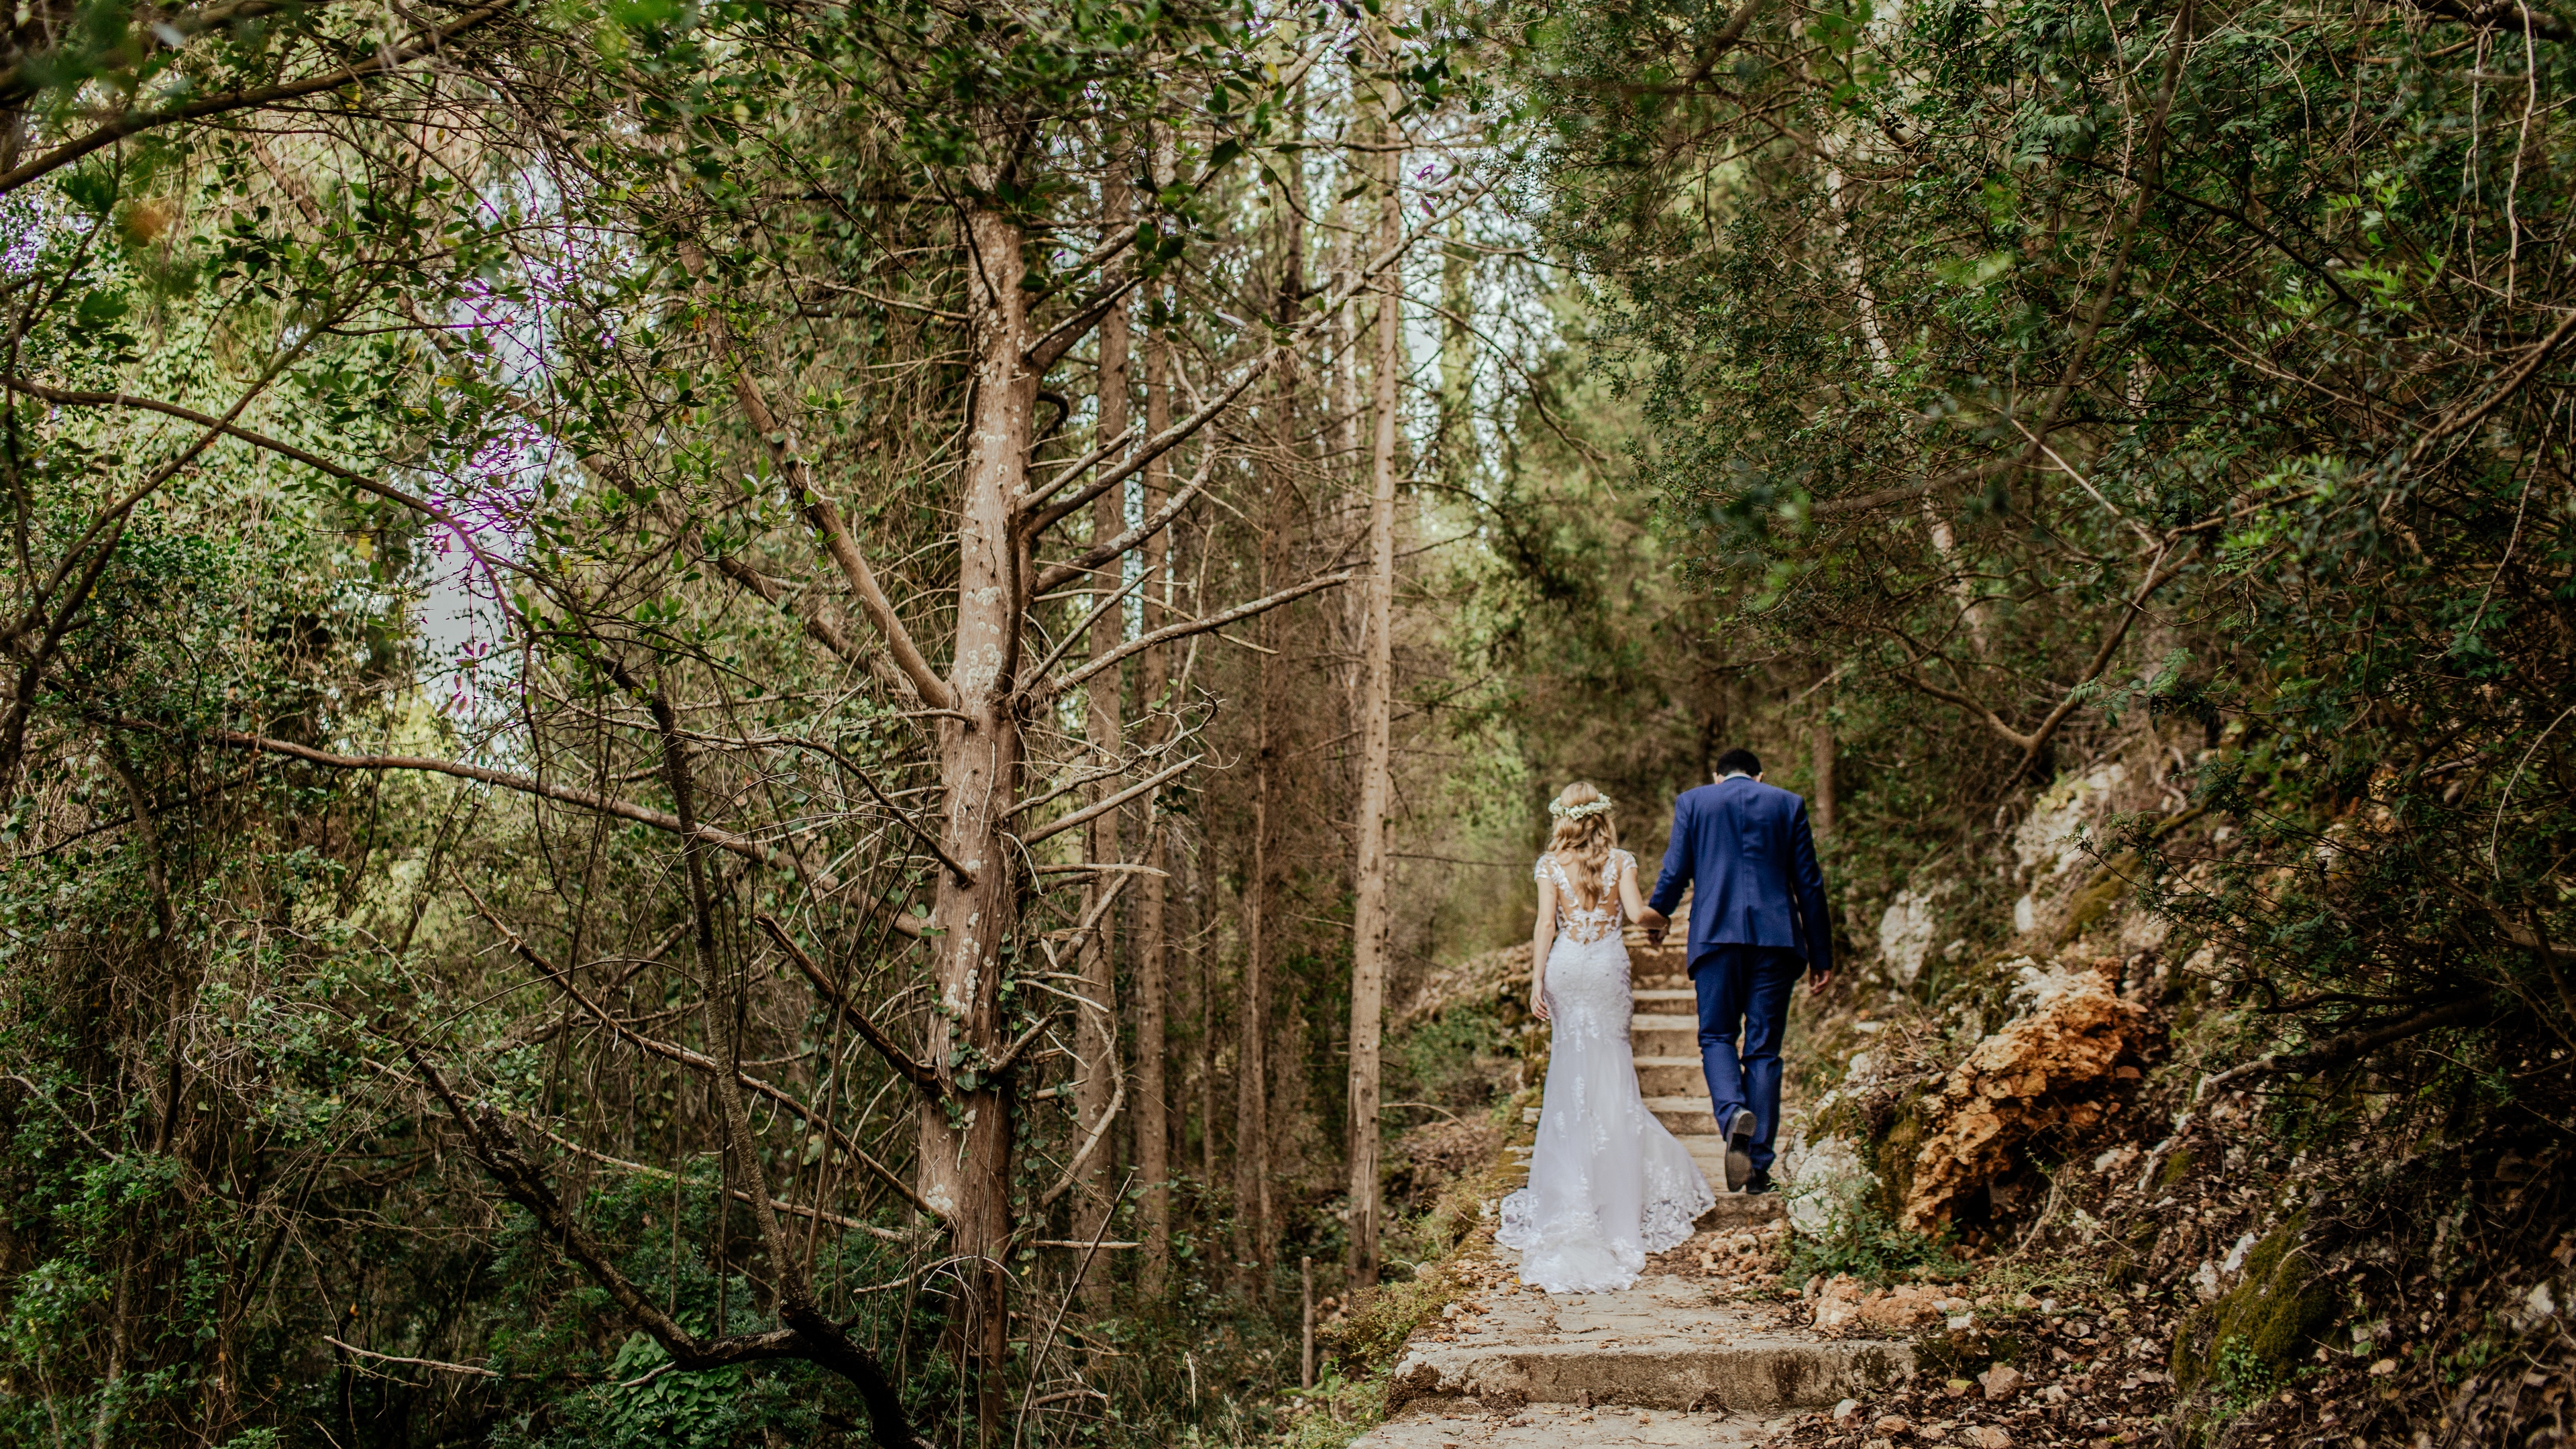 newlyweds marrieds couple love photoshoot walk 4k 1538344983 - newlyweds, marrieds, couple, love, photoshoot, walk 4k - newlyweds, marrieds, Couple